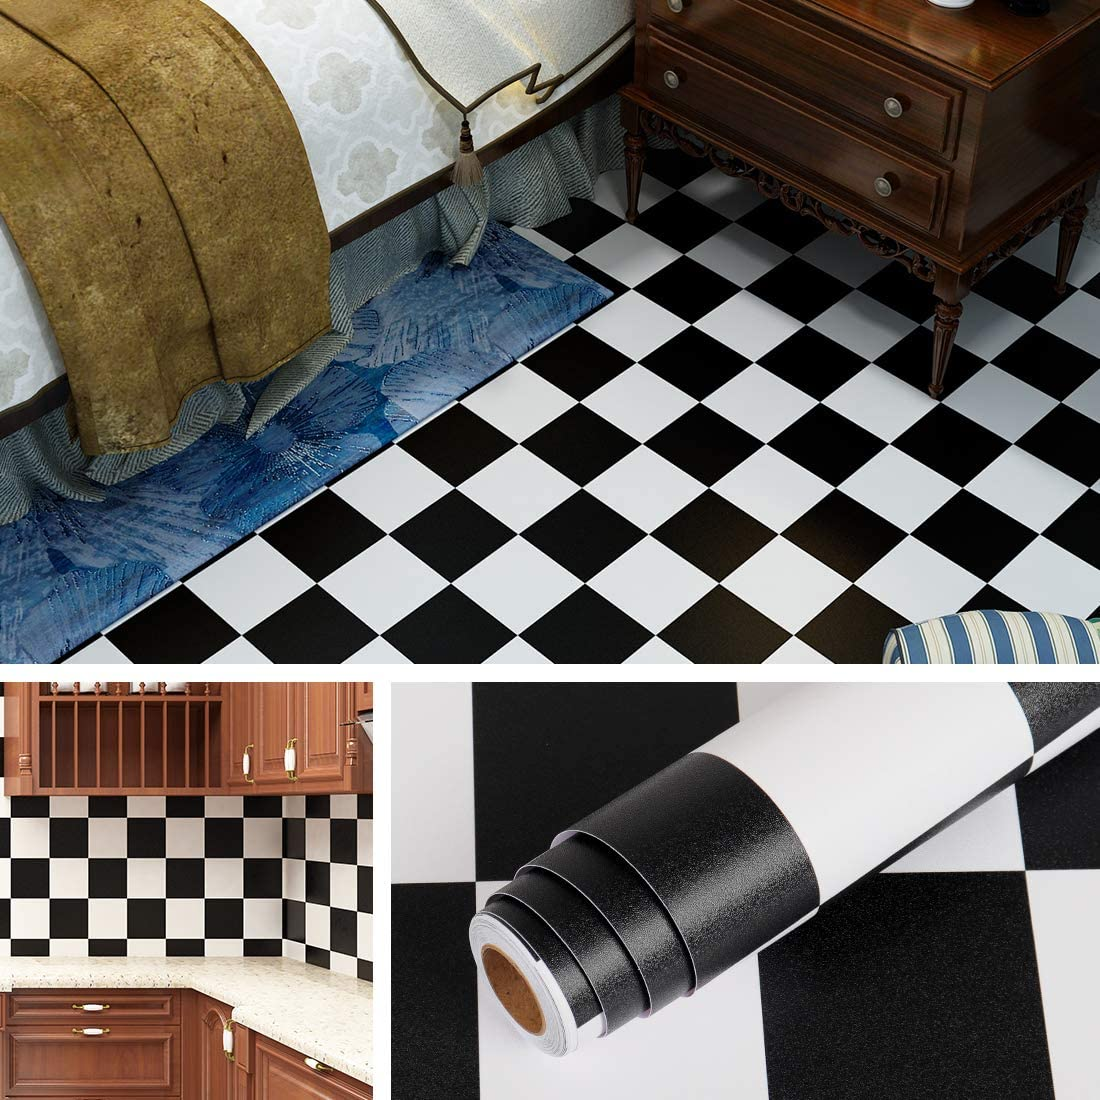 Livelynine Checkered Black And White Vinyl Flooring Roll 15 8x78 8 In Waterproof Peel And Stick Floor Tile For Bedroom Kitchen Backsplash Bathroom Floor Covering Peel And Stick Flooring Stickers Amazon Com